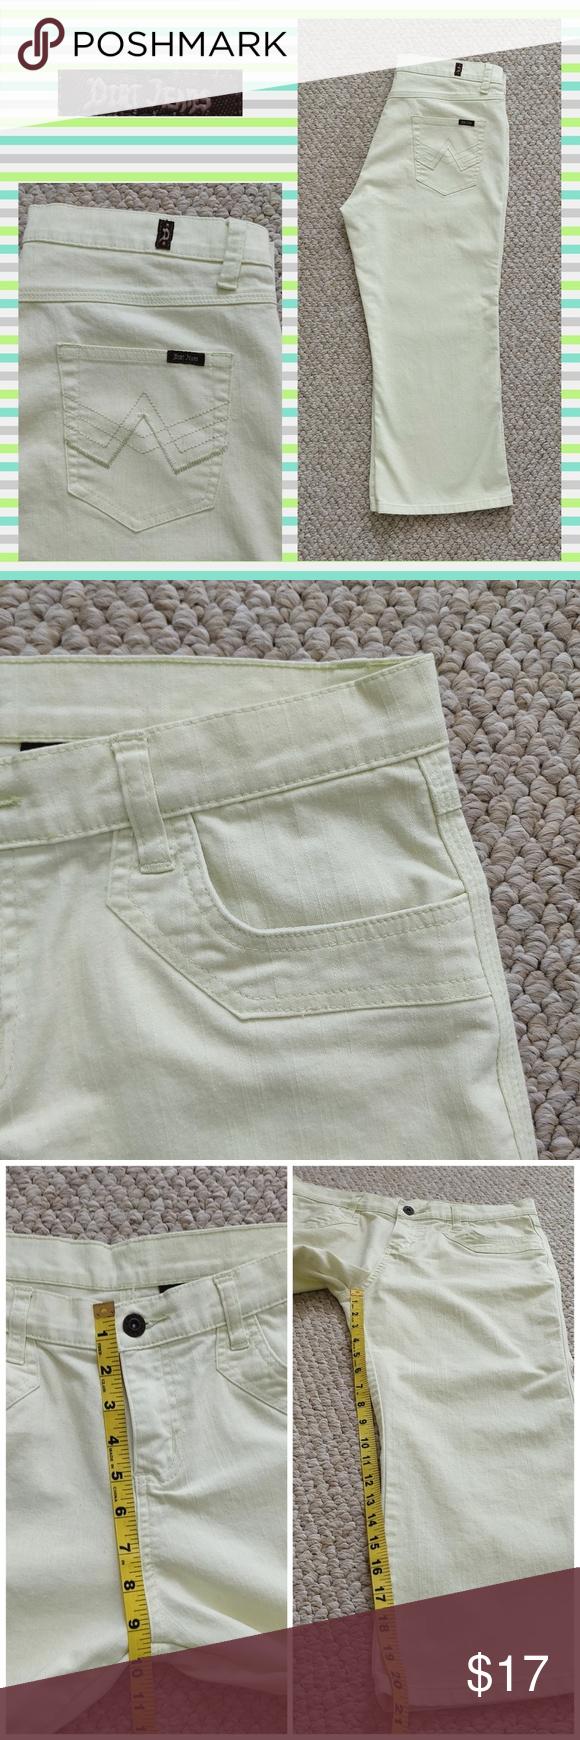 8b5875fd5b272f24751b8976daabf53f - How To Get Dirt Stains Out Of Light Jeans